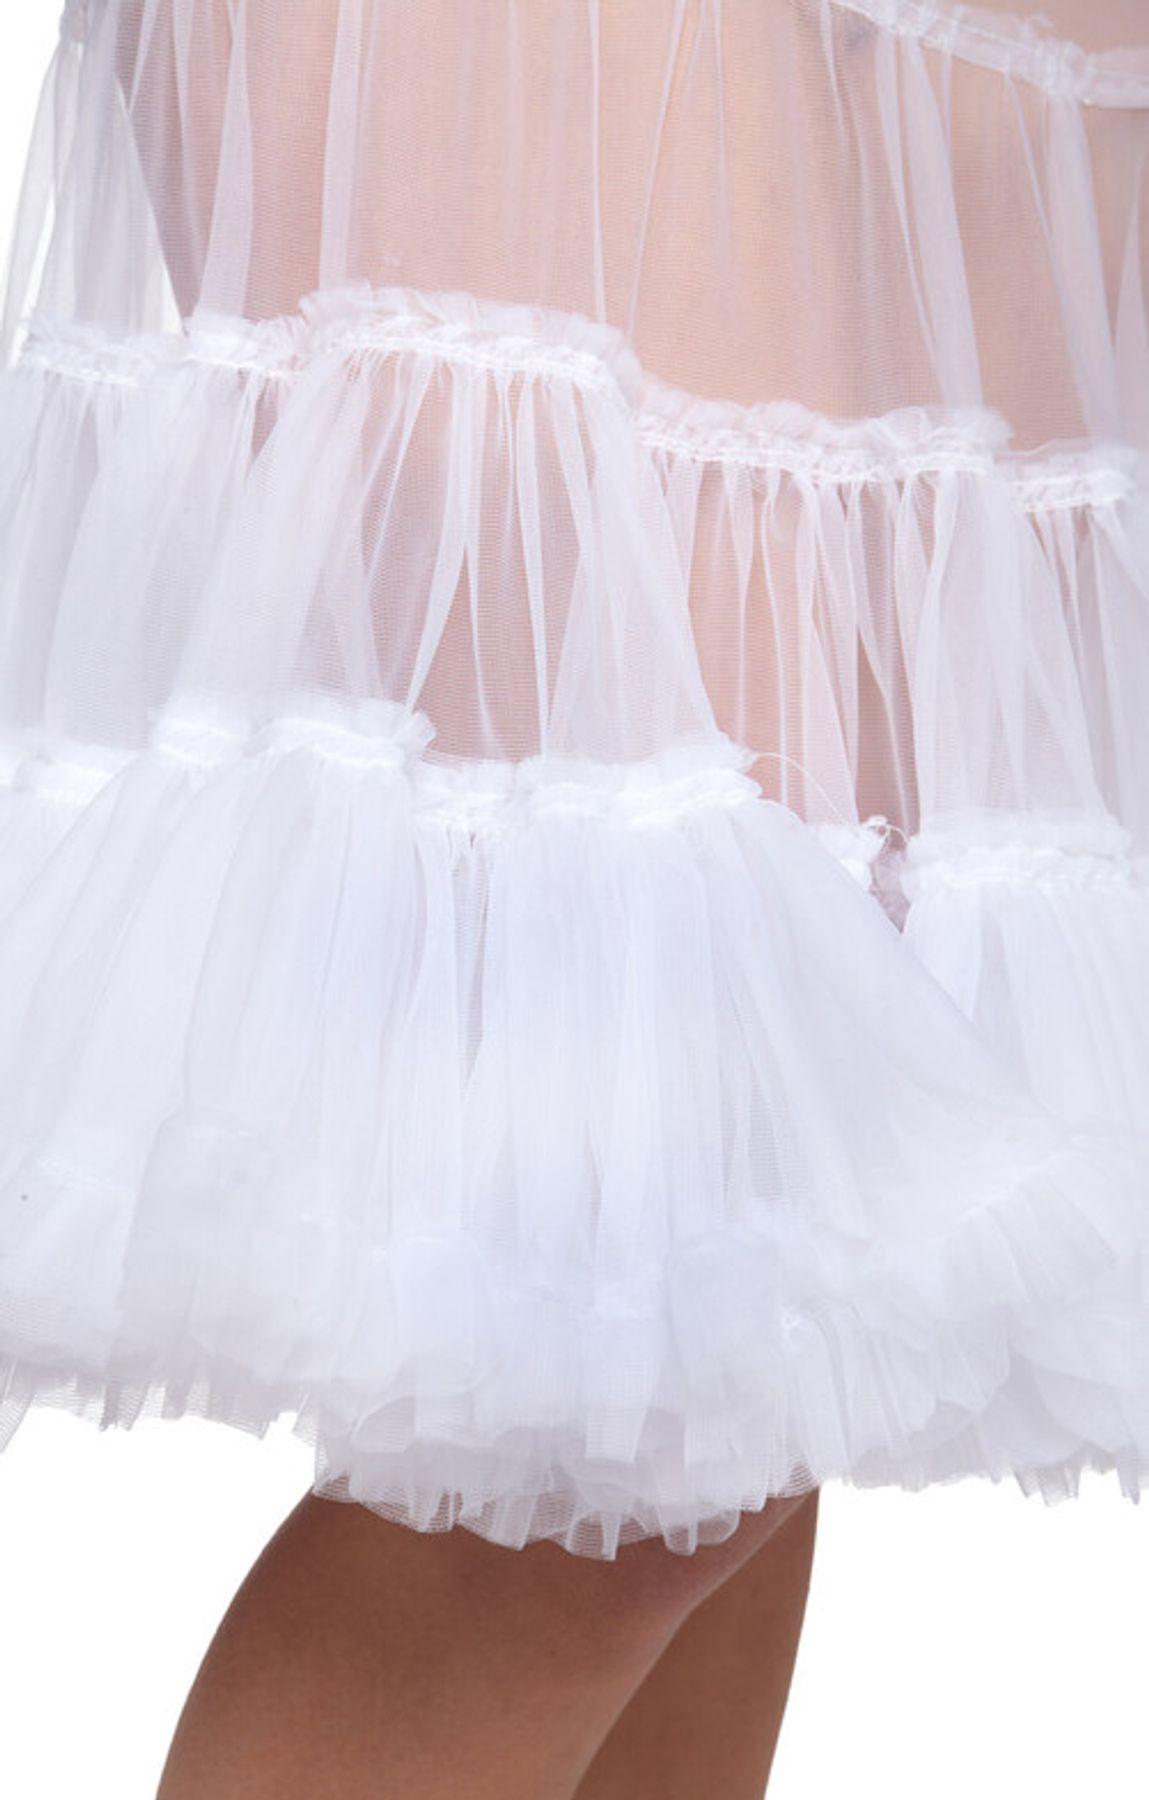 Stockerpoint - Trachten Dirndl Petticoats 60cm, U-90 – Bild 8